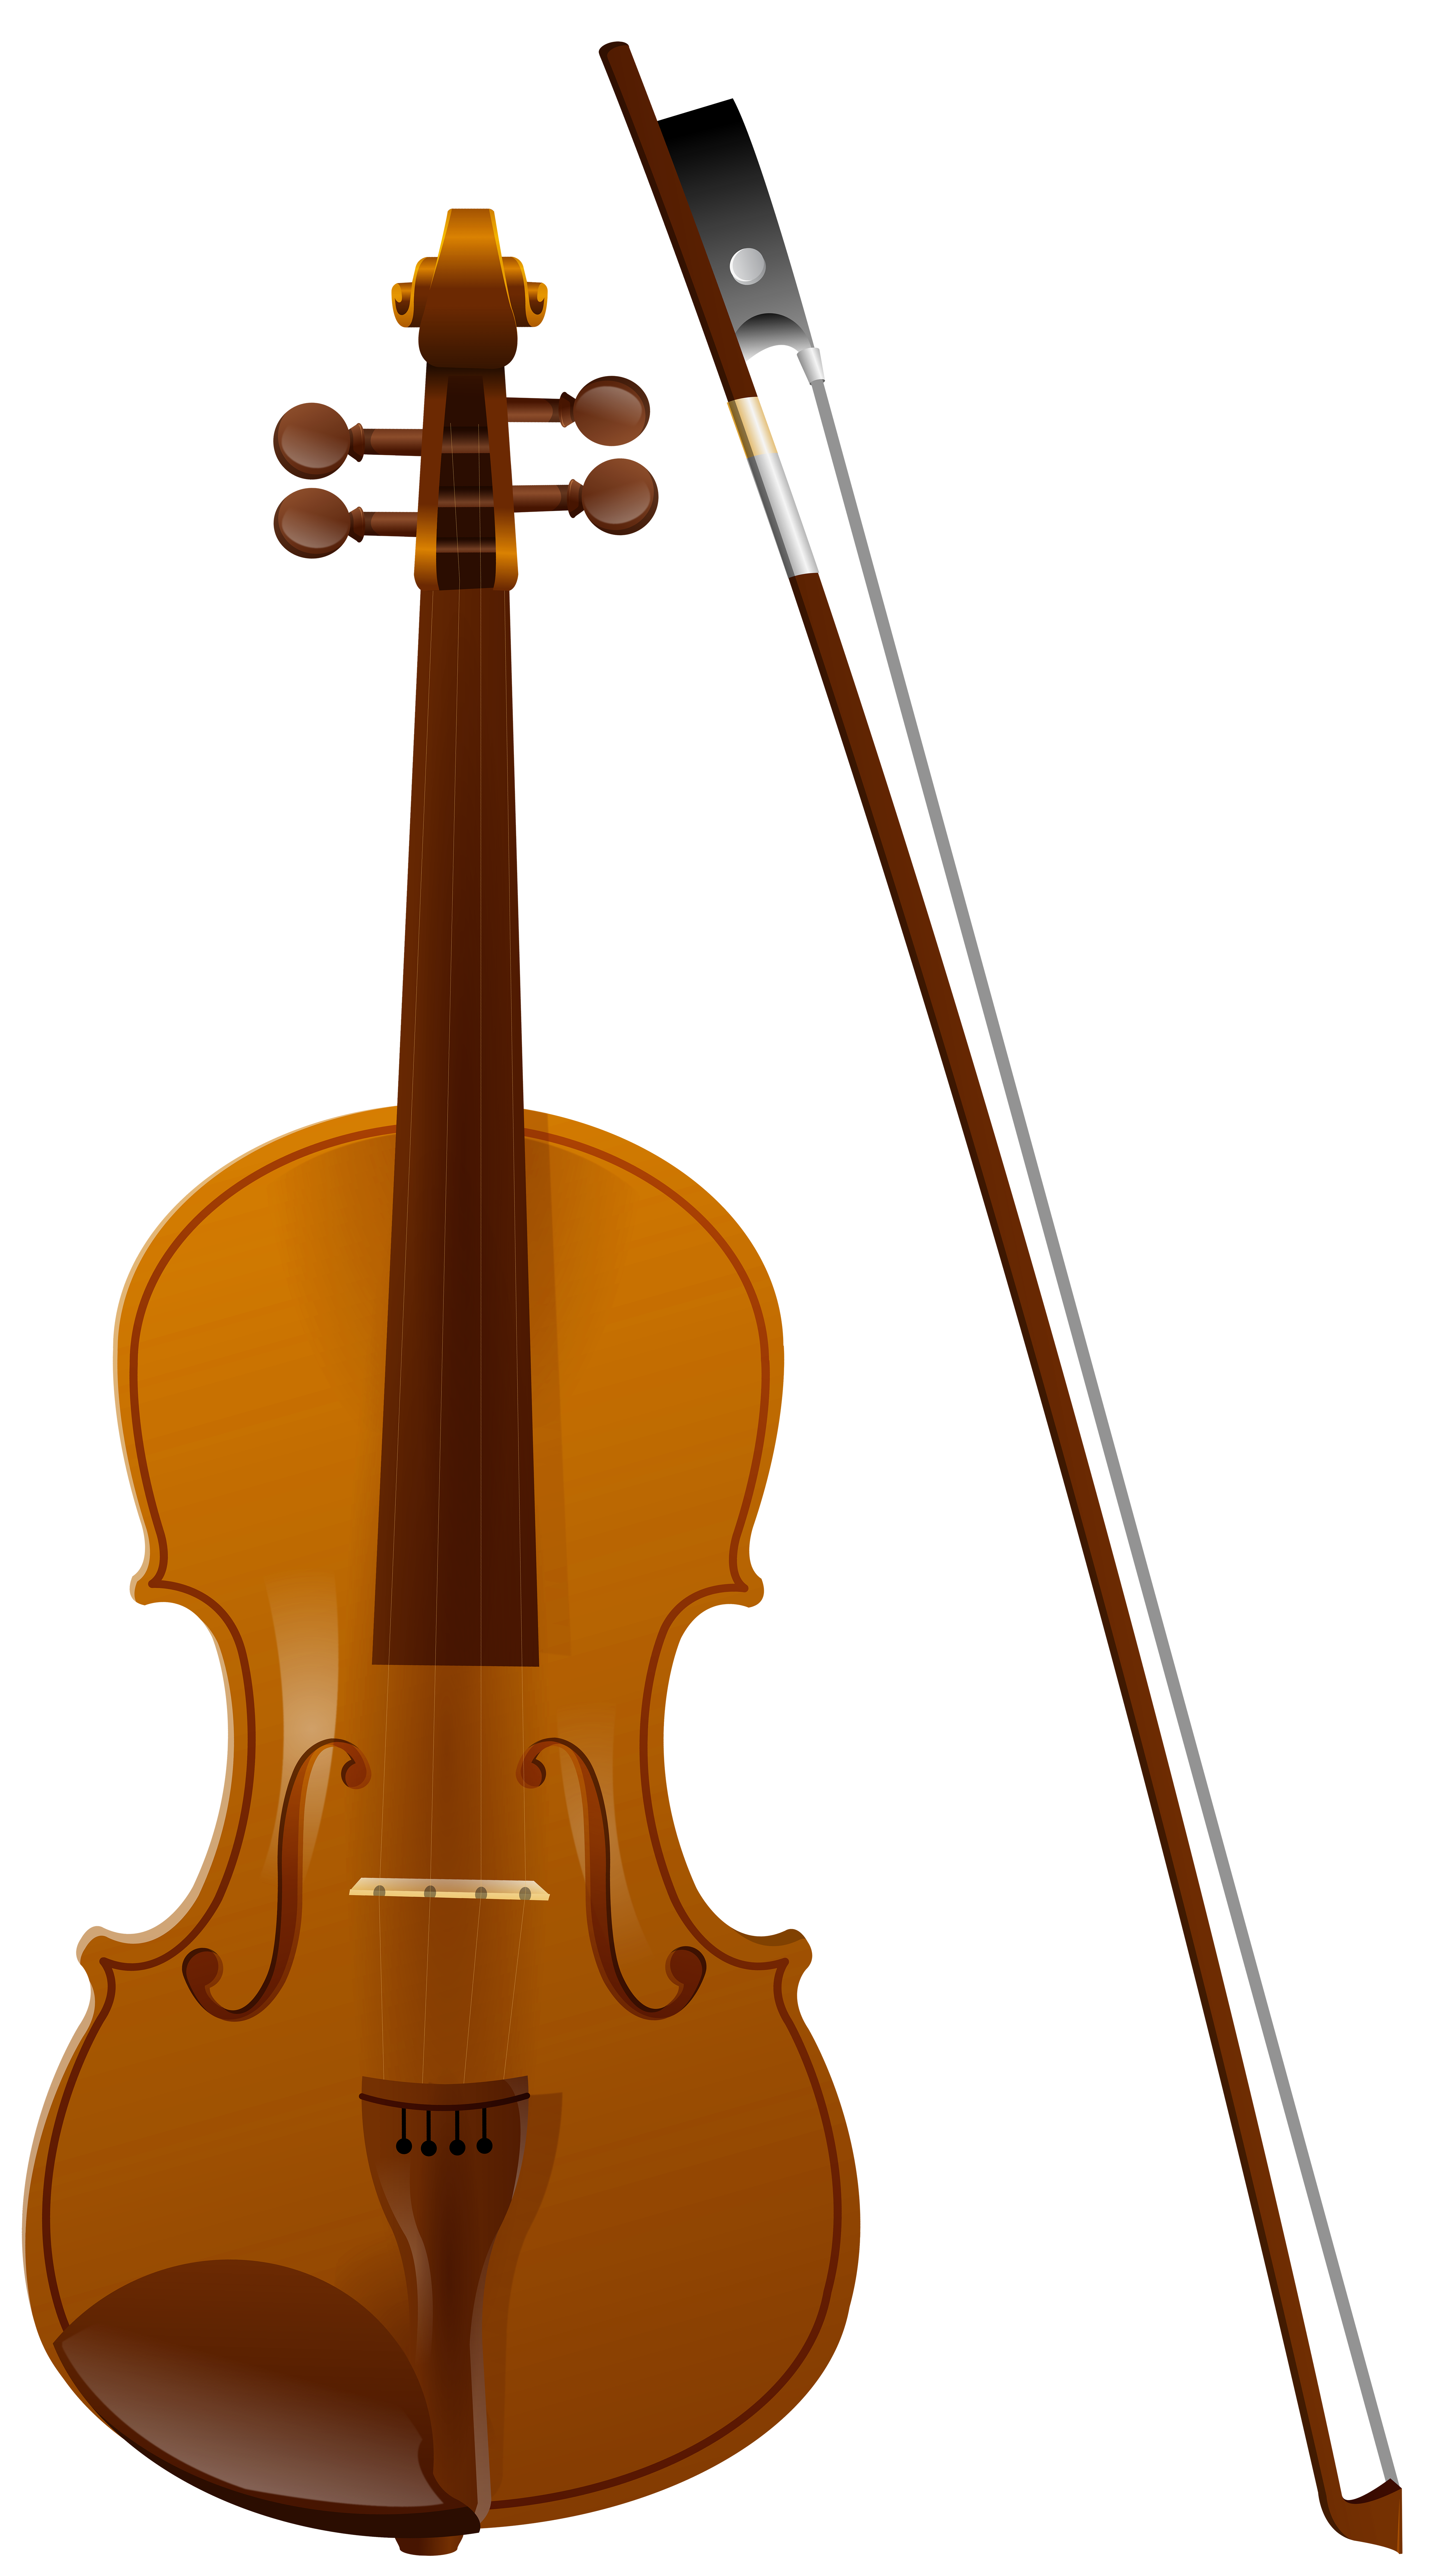 Piano clipart violin. Png clip art image